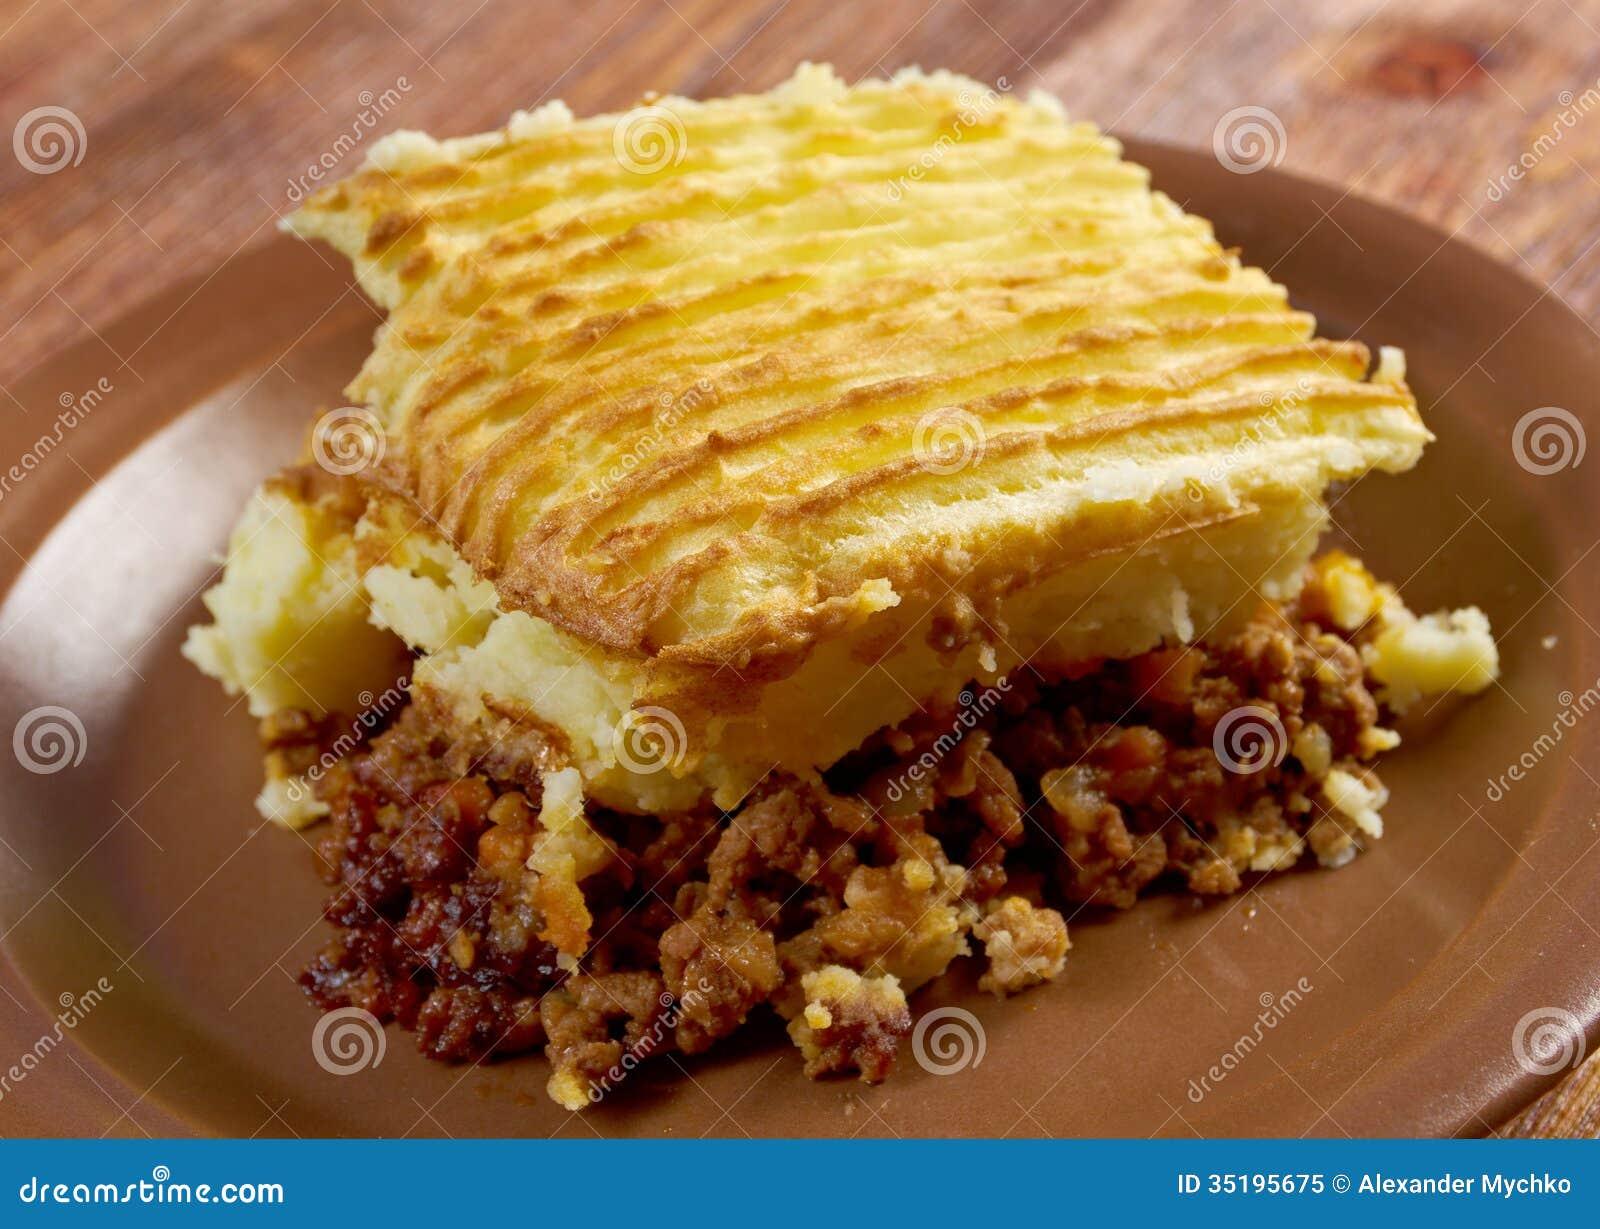 Cottage Pie Royalty Free Stock Photo - Image: 35195675